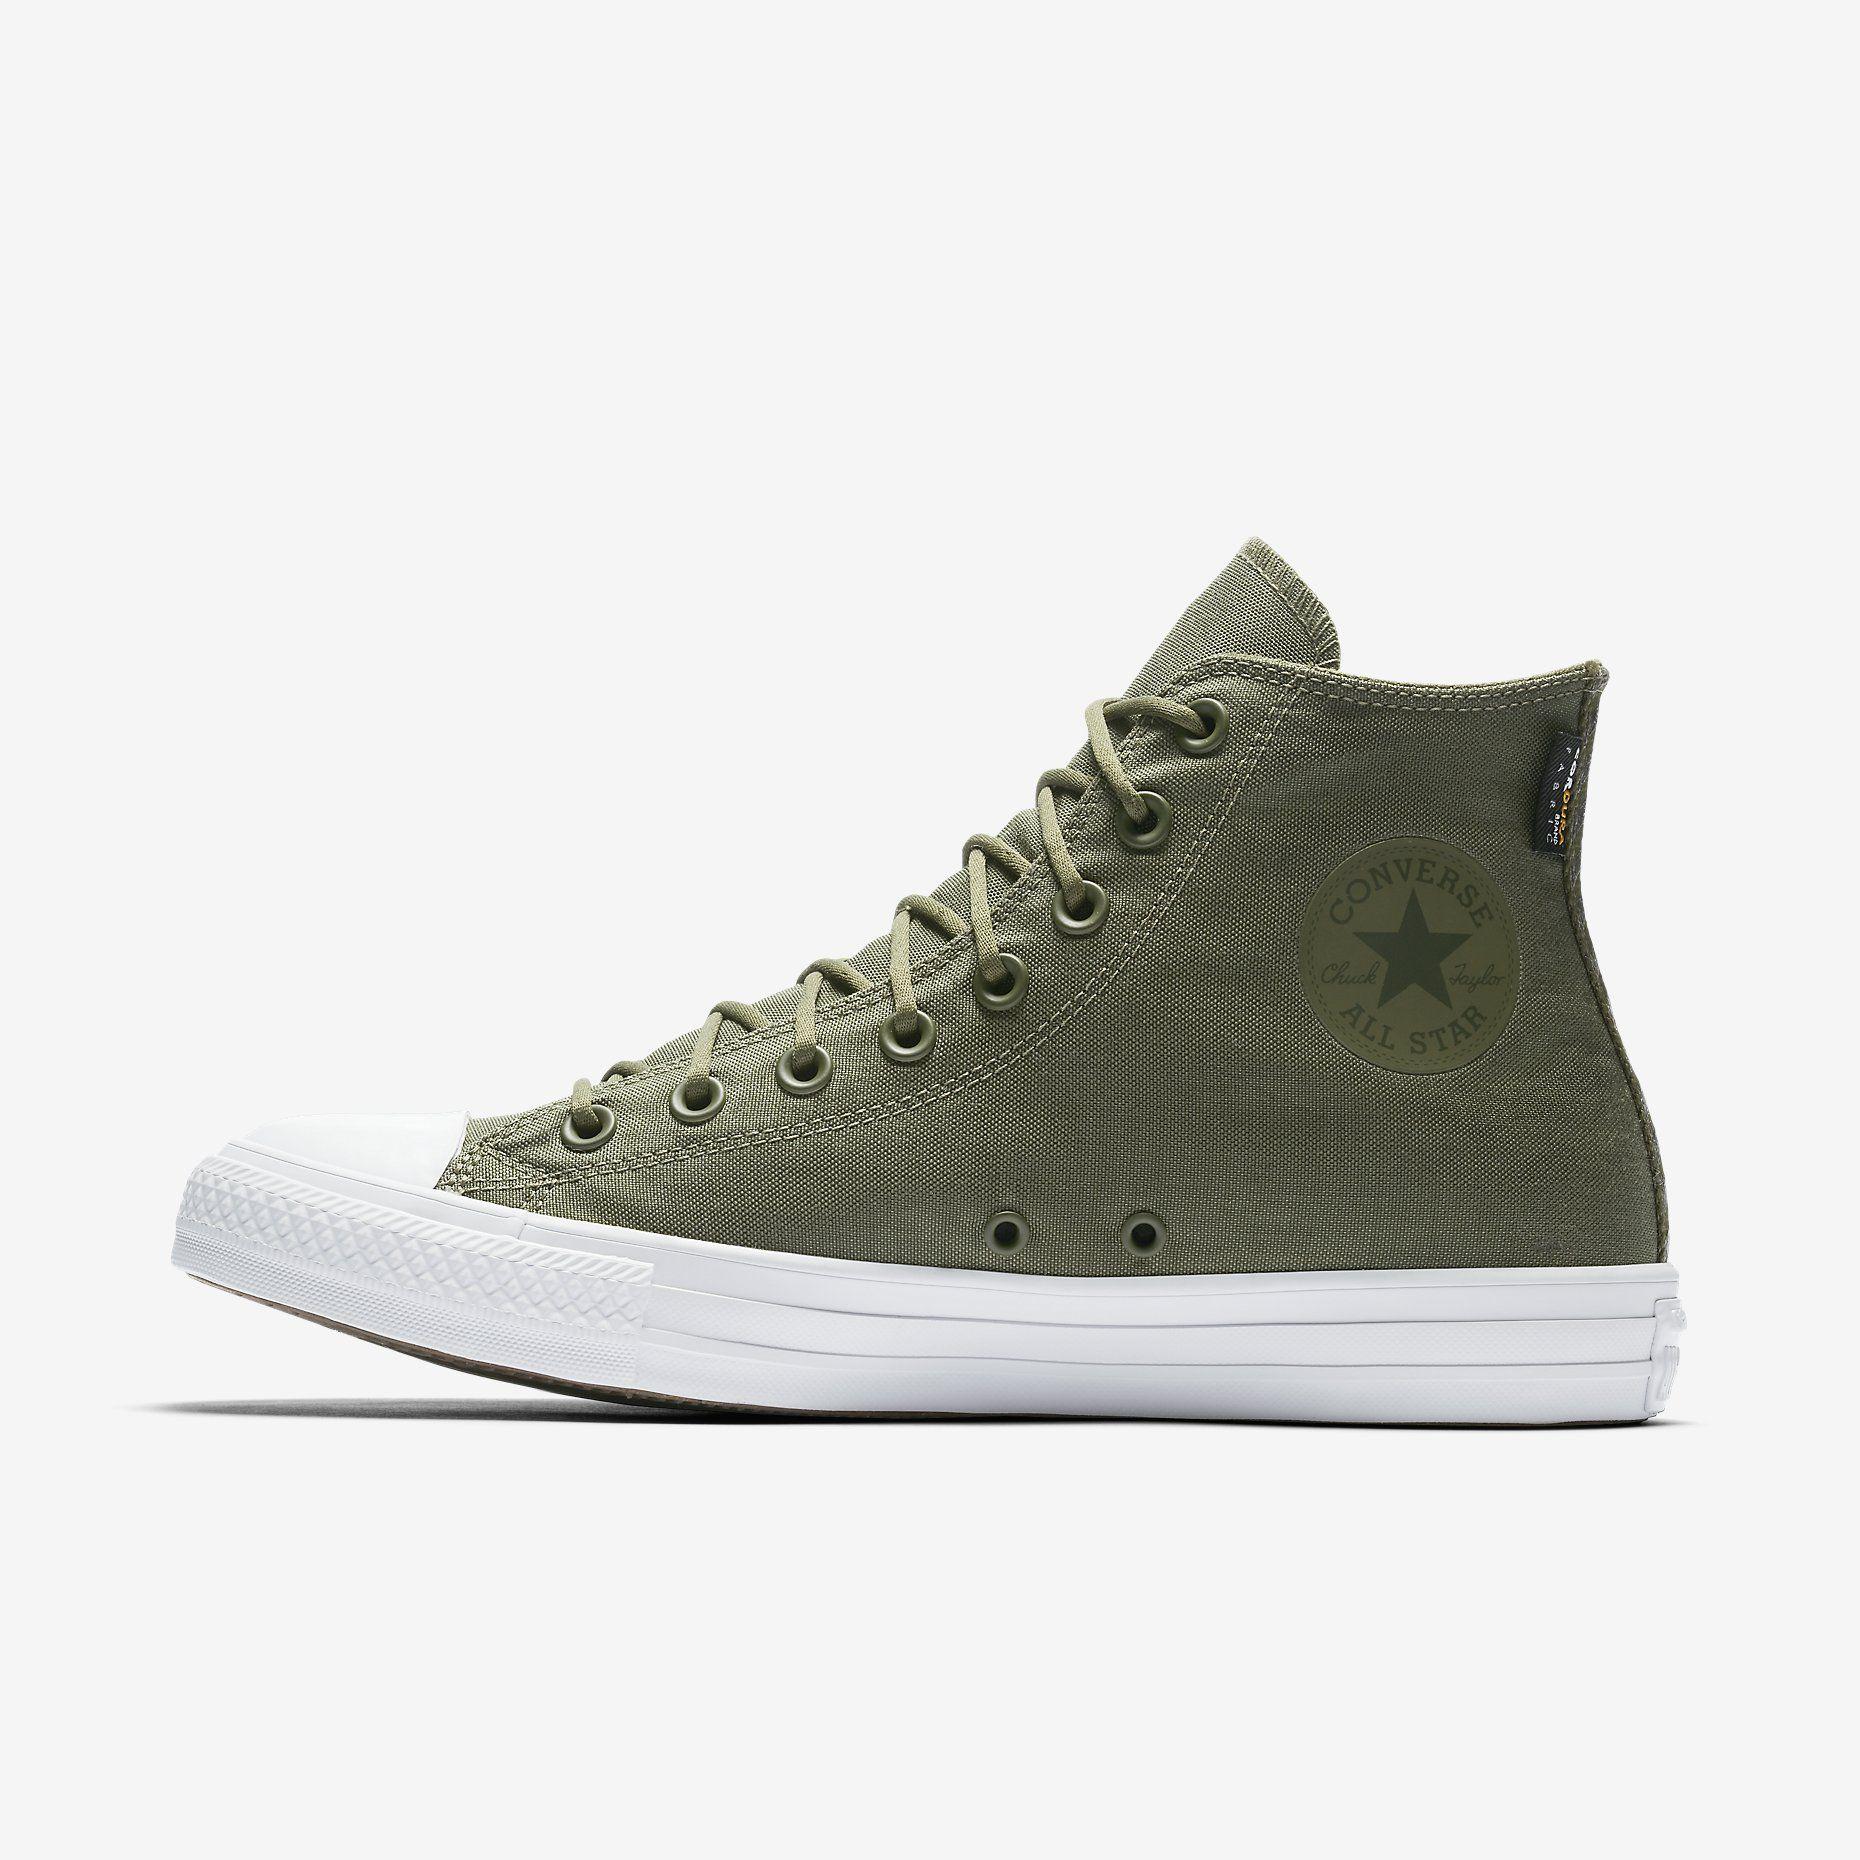 0eacf9a7b4bf90 Converse Chuck Taylor All Star Cordura High Top in Medium Olive via Nike.com